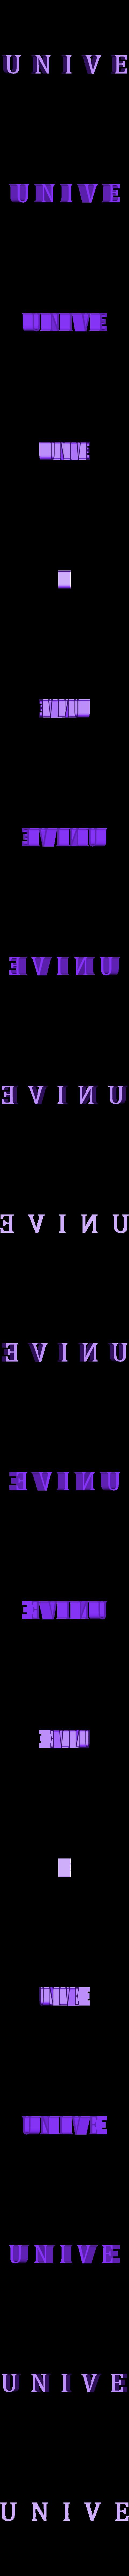 Break_UNIVE_01.stl Download free STL file The Magicians - Brakebills University Logo • 3D printing template, SYFY